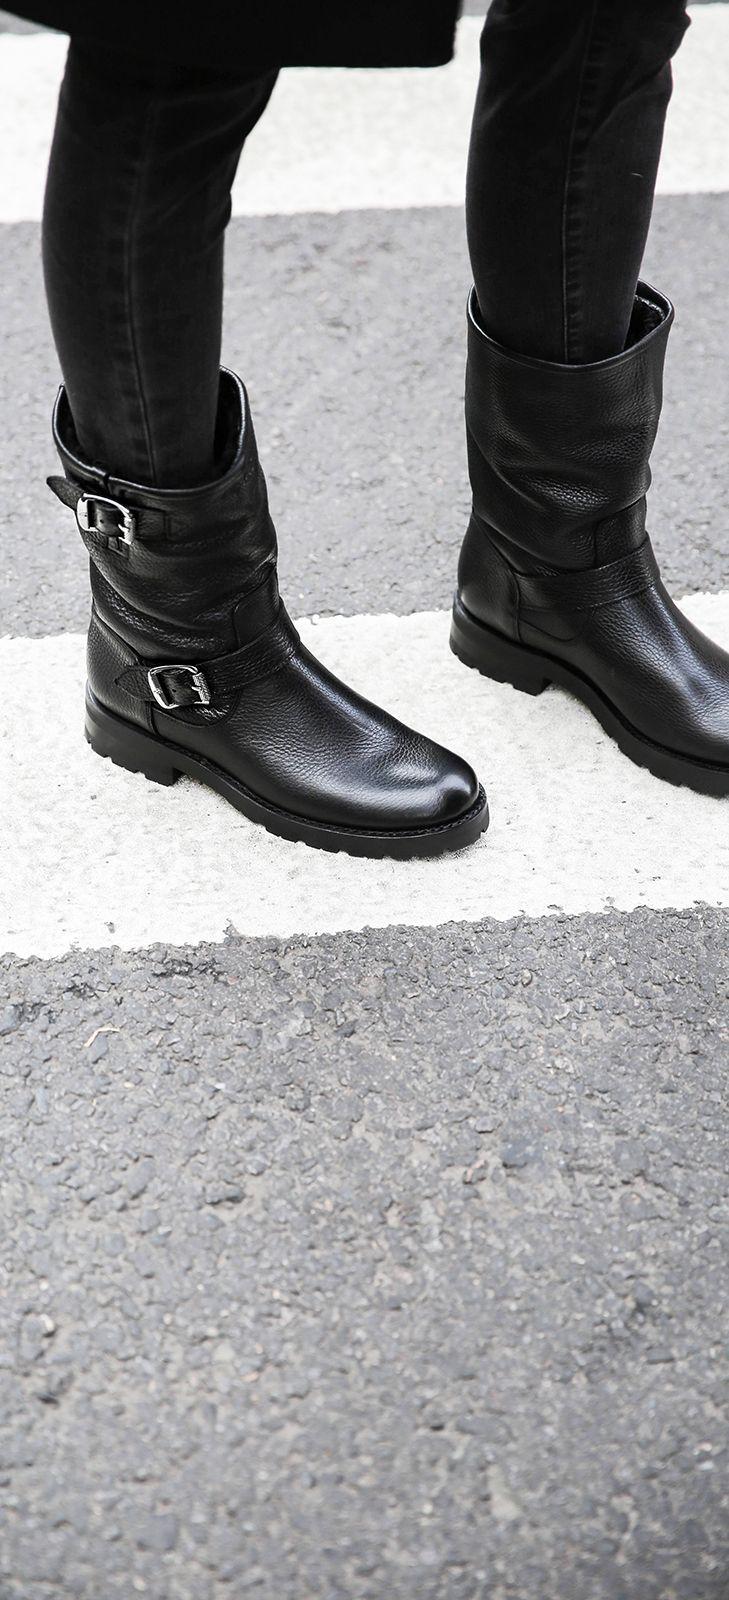 2dd00d4d96 Natalie Mid Engineer Lug Shearling | FRYE Since 1863 | Shoes ...